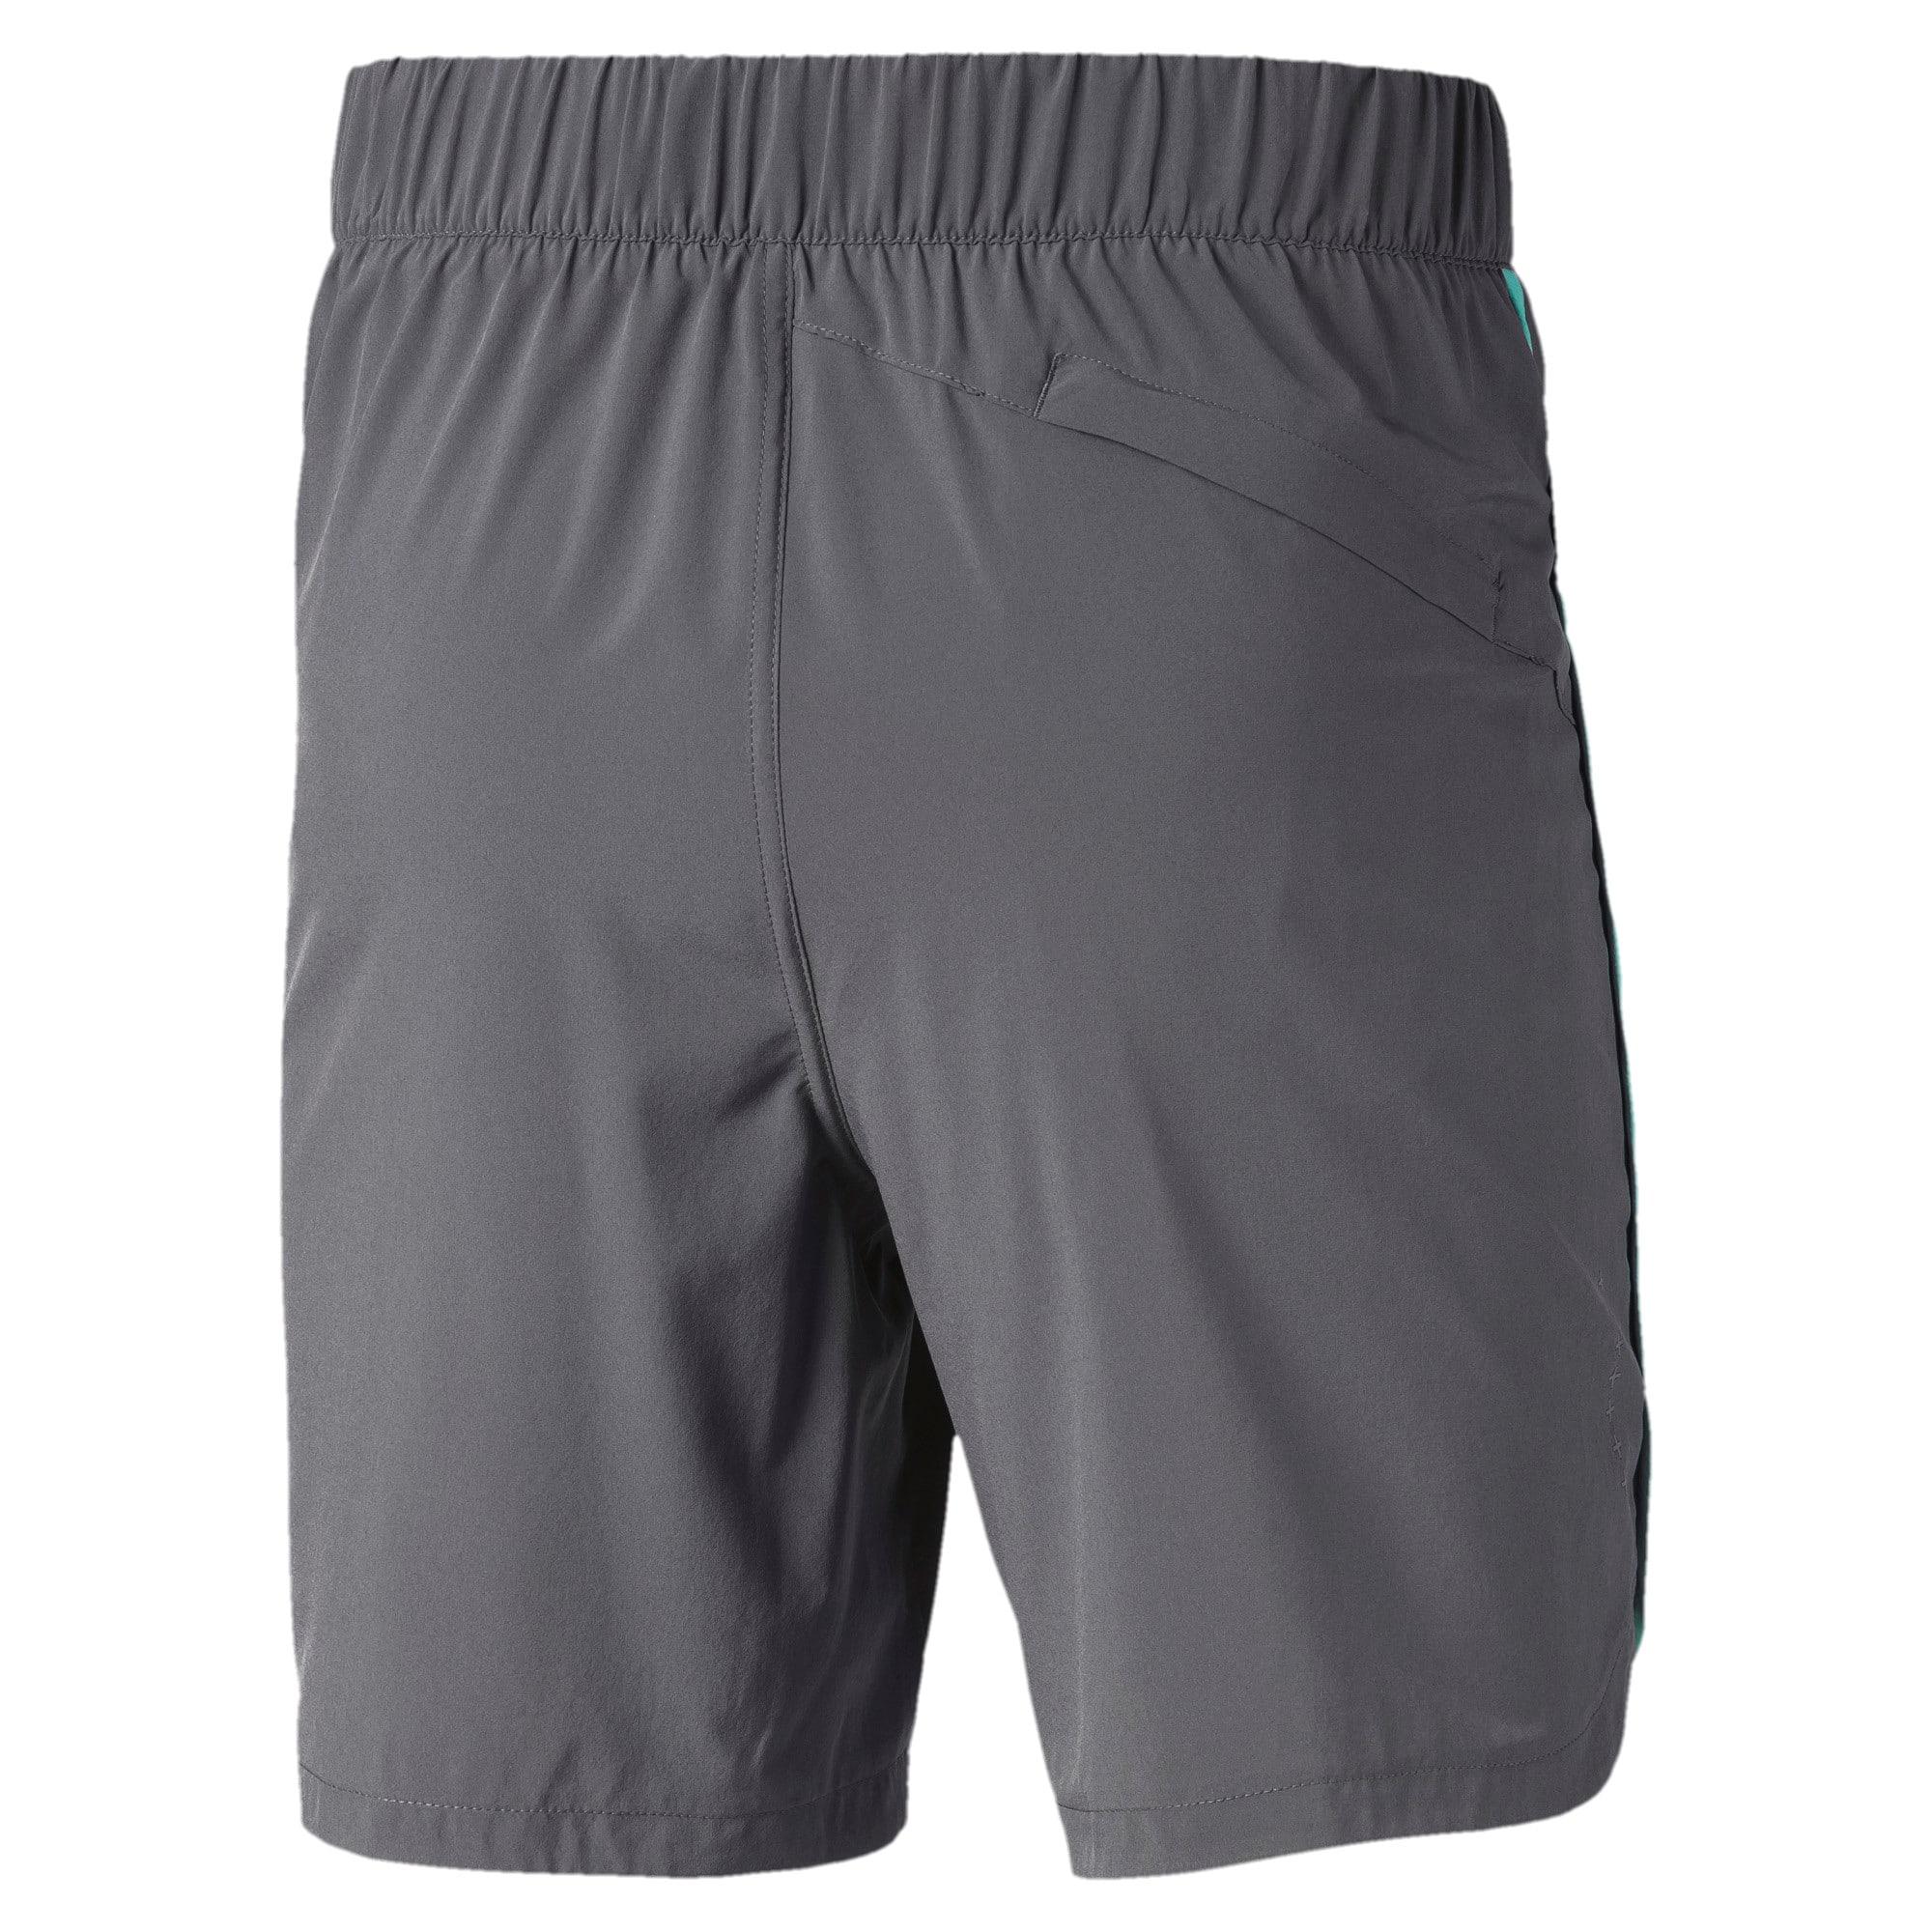 Thumbnail 2 of Get Fast Men's Shorts, CASTLEROCK-Blue Turquoise, medium